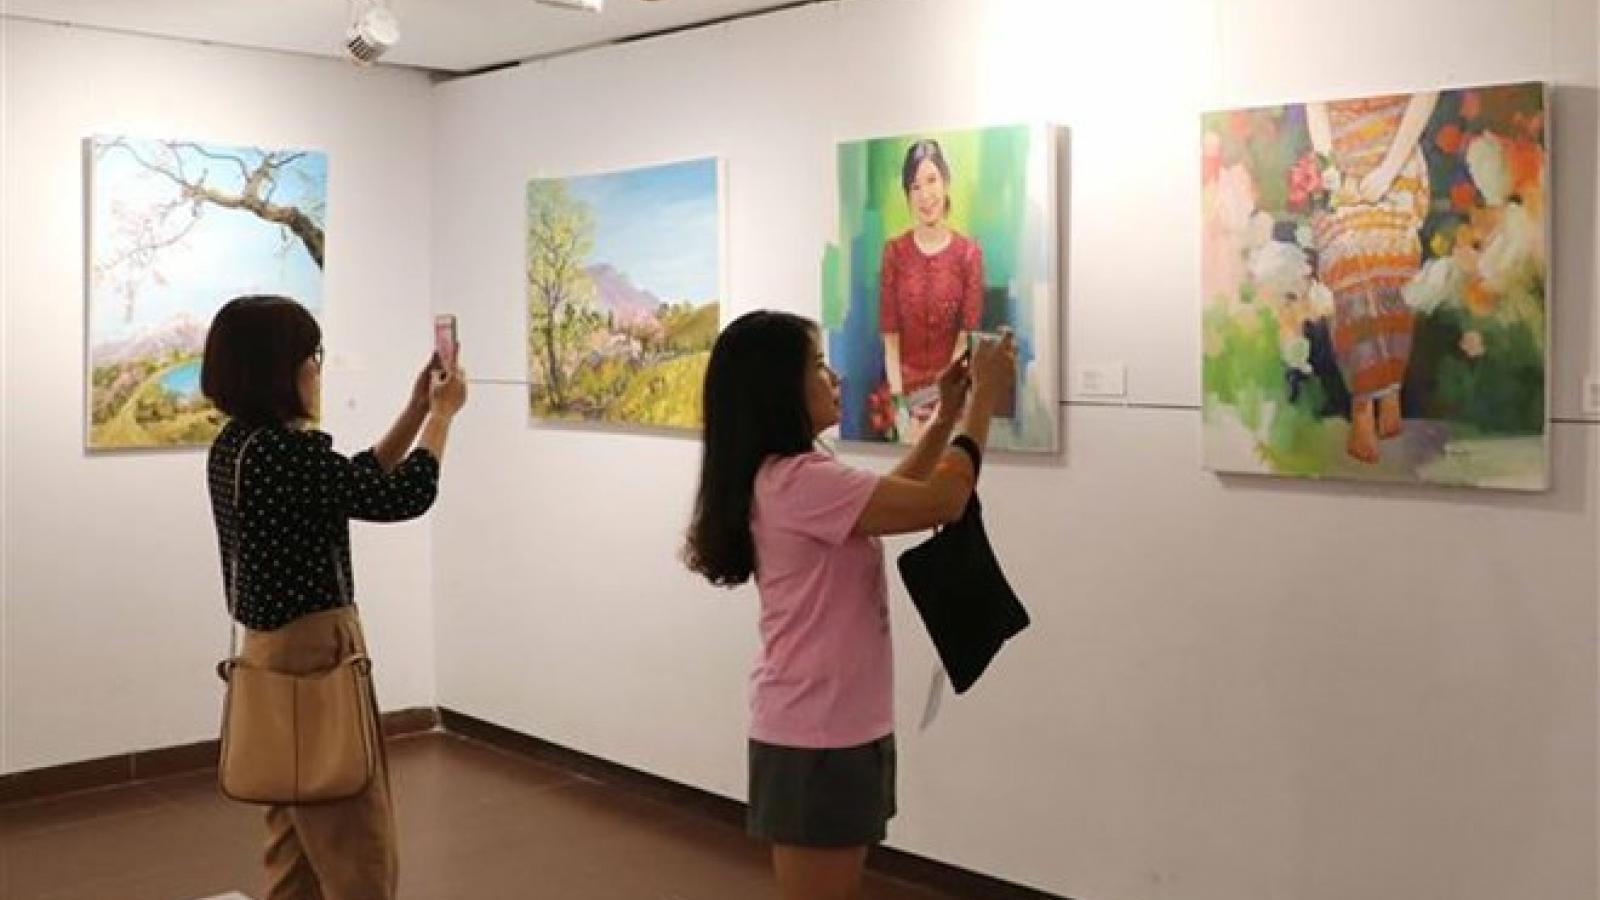 Da Nang hosts first international fine arts exchange workshop & exhibition